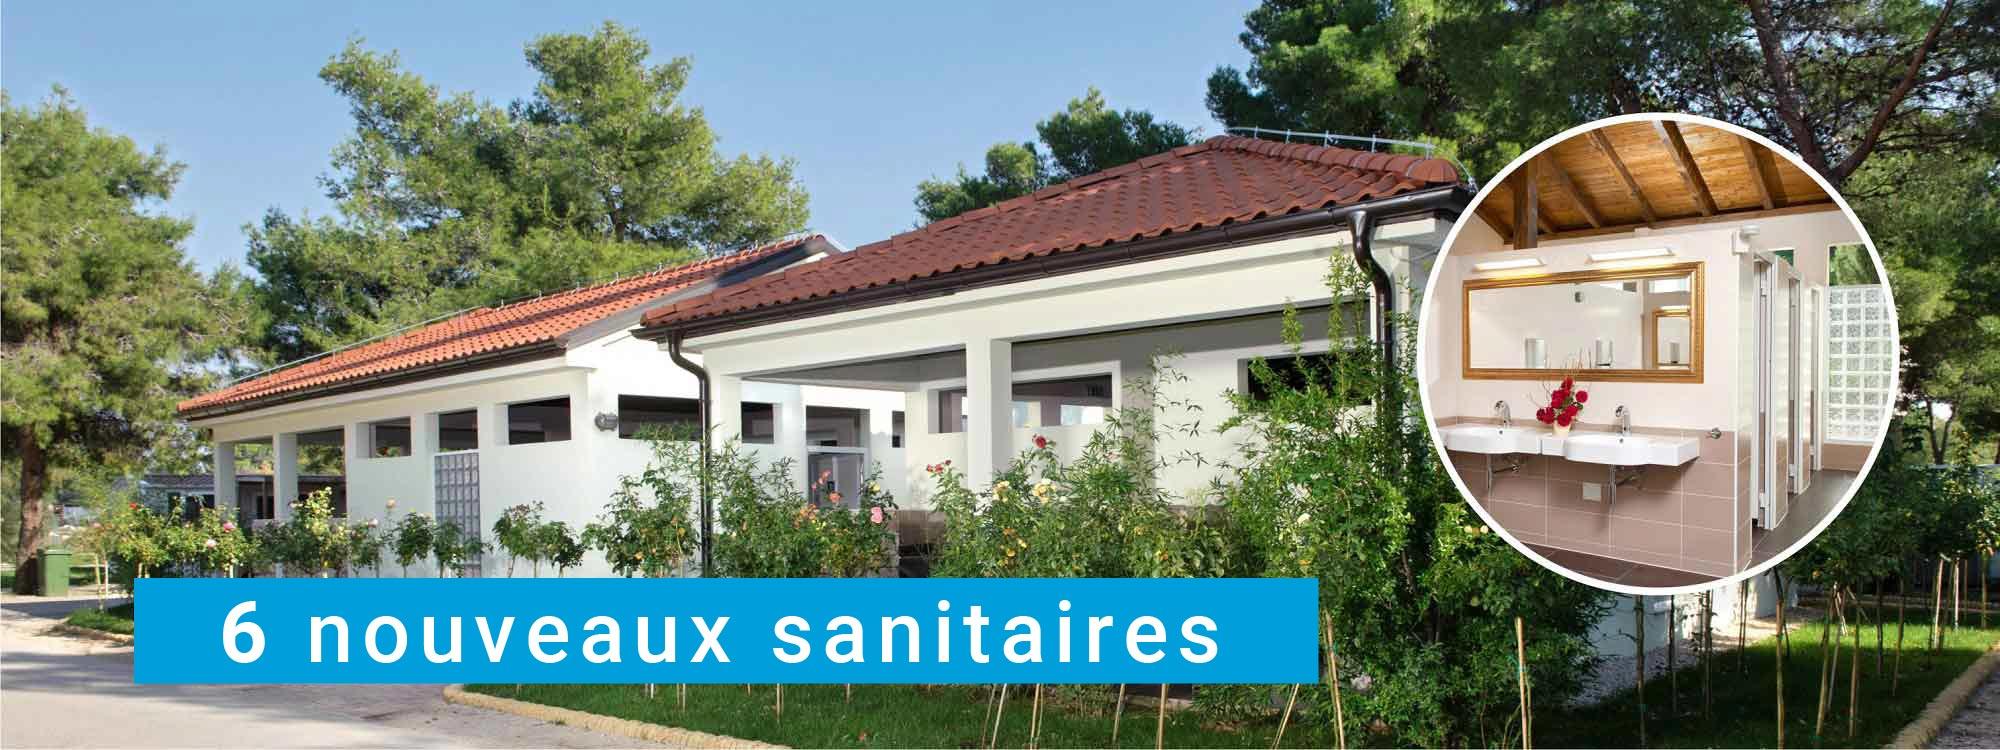 Web-slider-sanitary-facilities-01